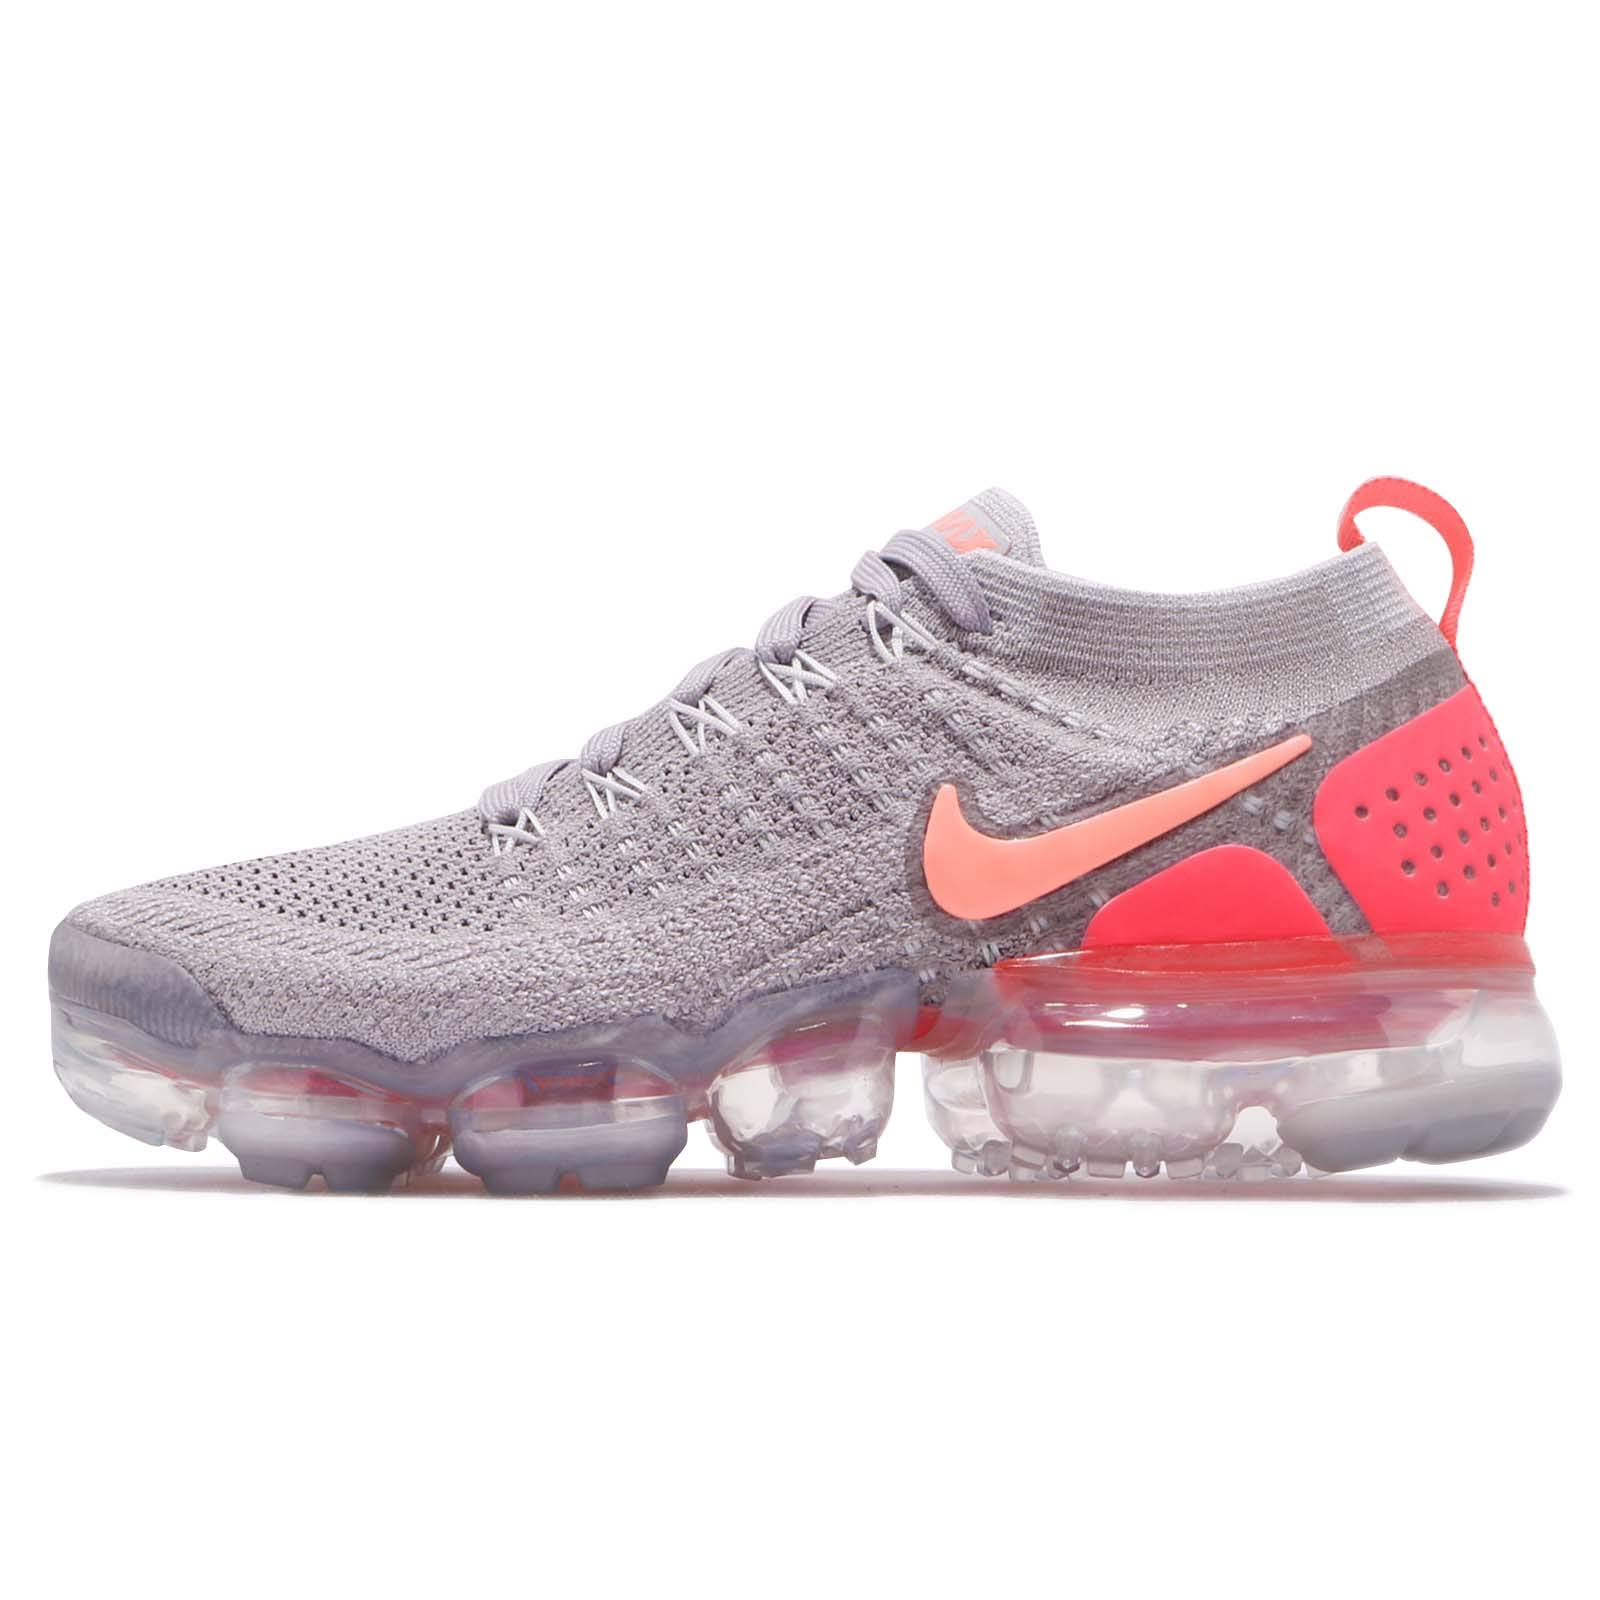 air vapormax flyknit 2 running sneakers